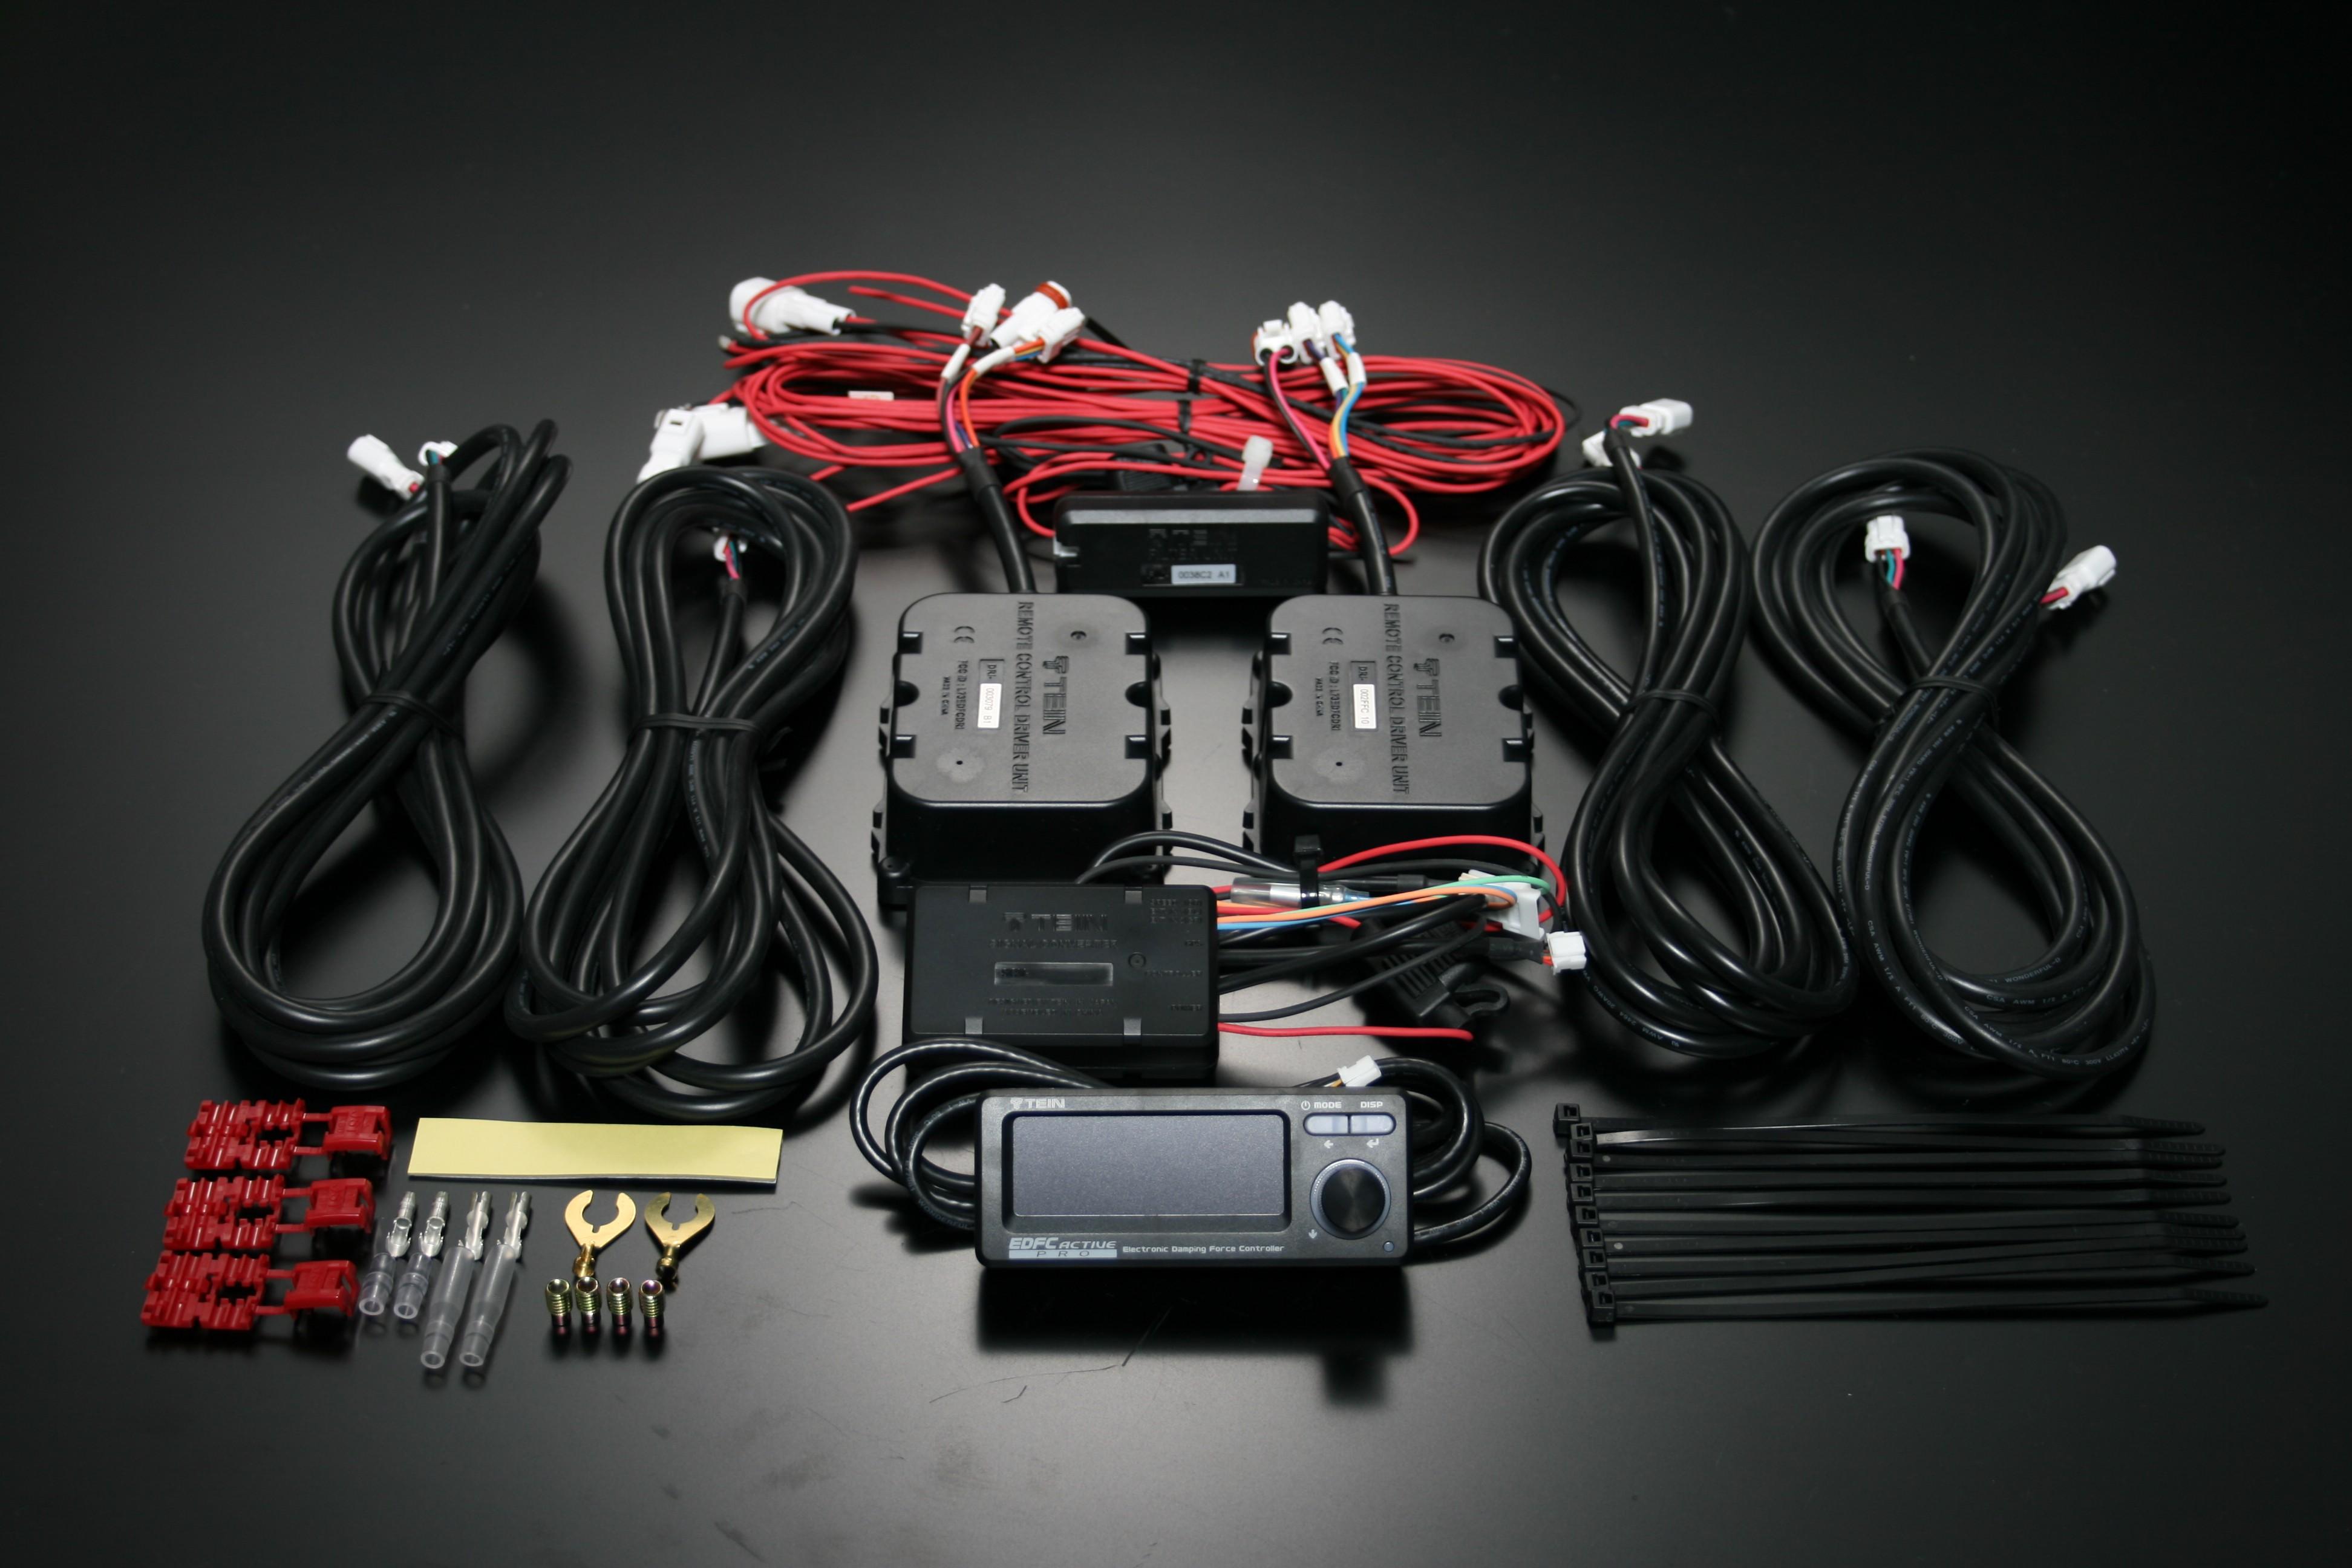 Tein EDFC Active Pro Controller Kit